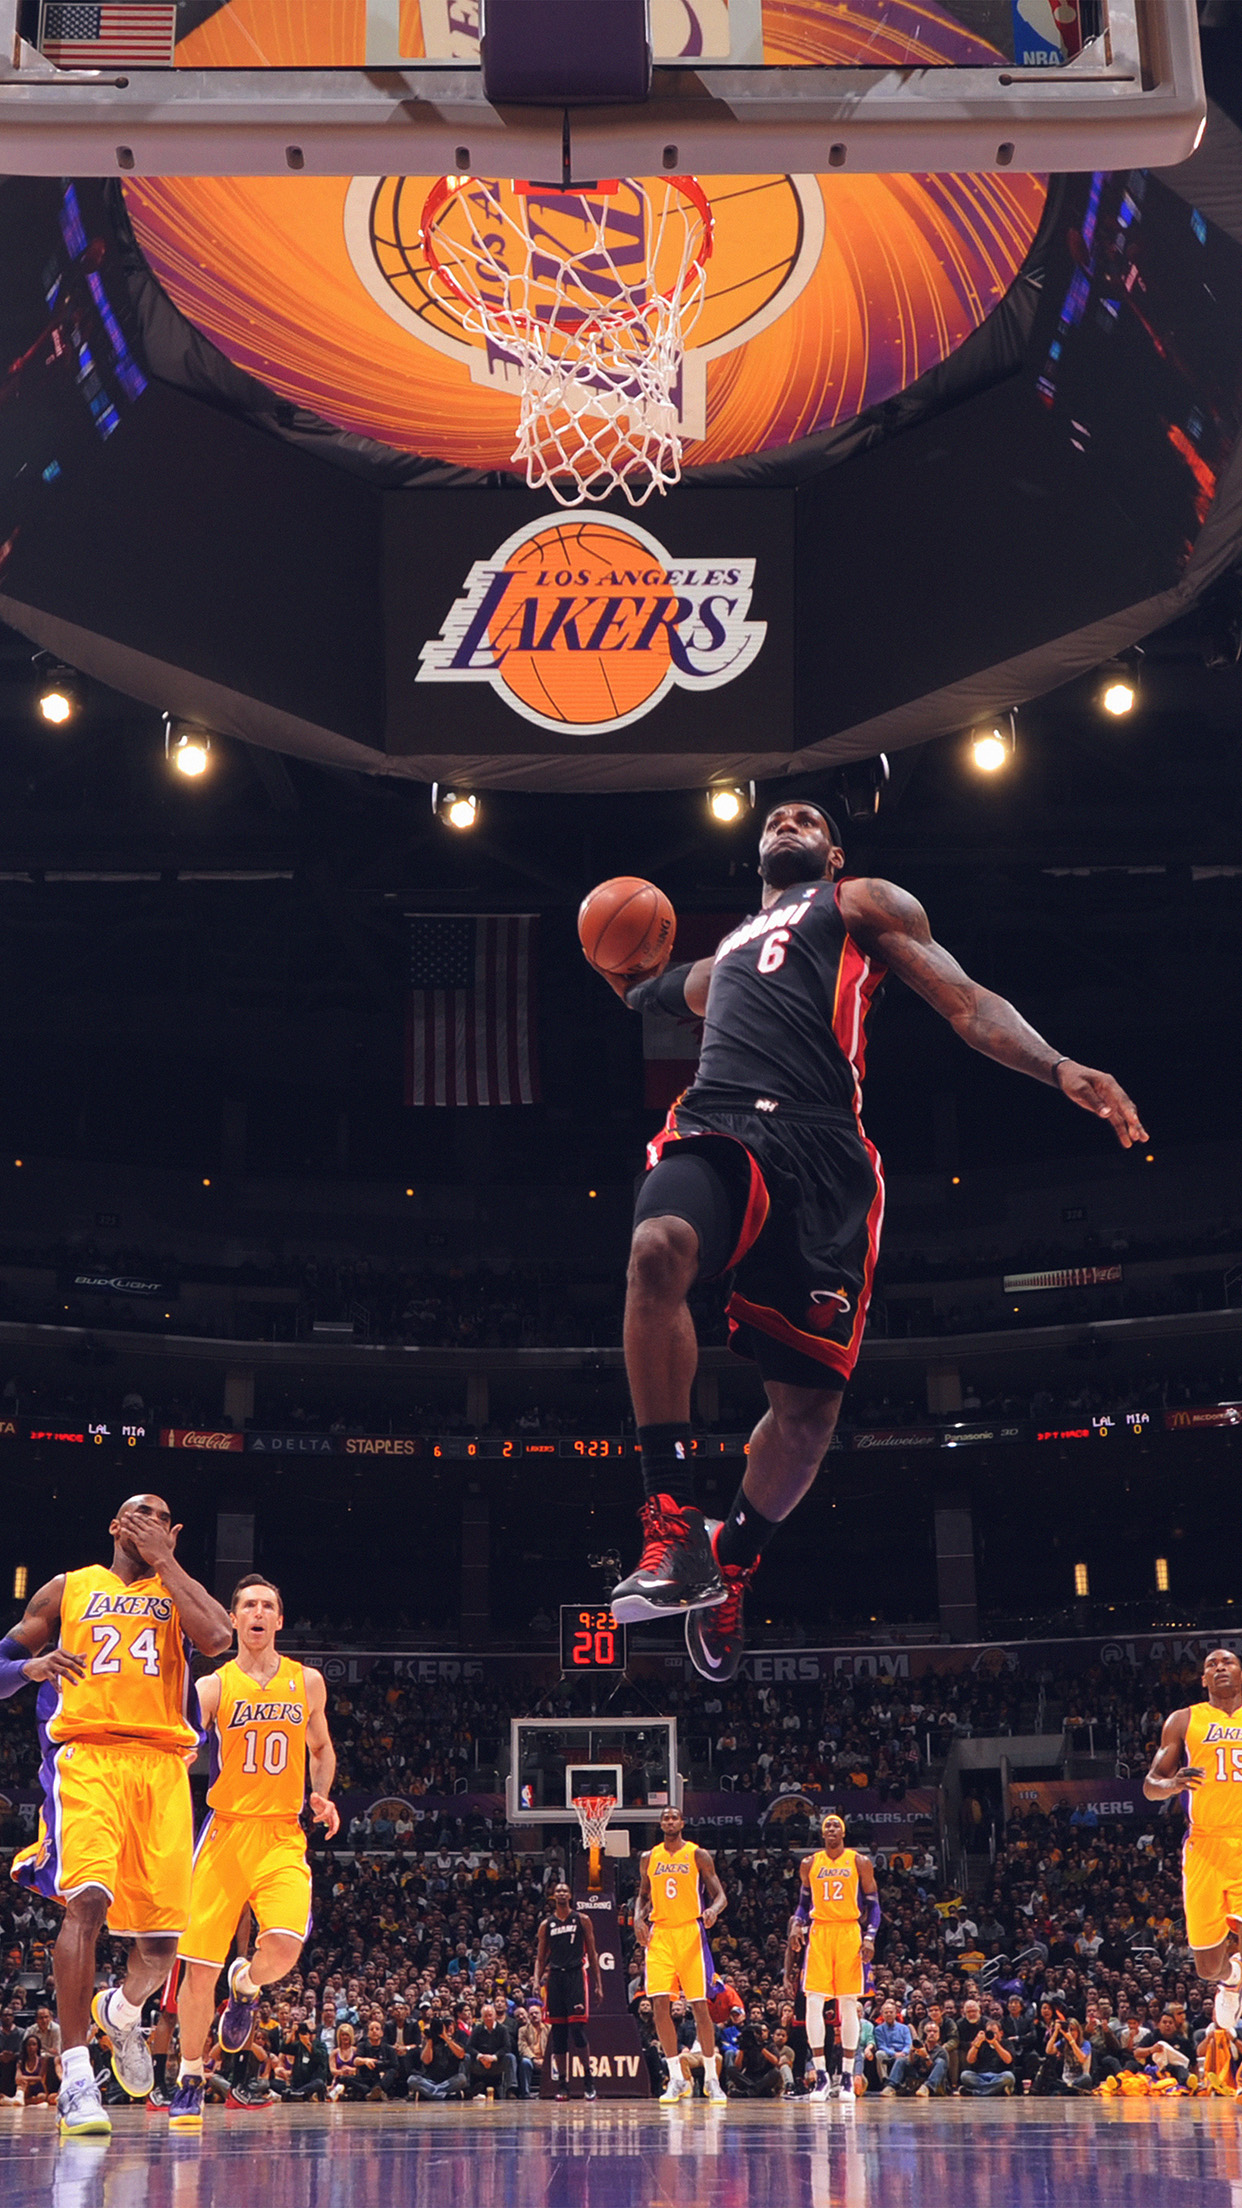 hi84-lebron-james-nba-basketball-dunk